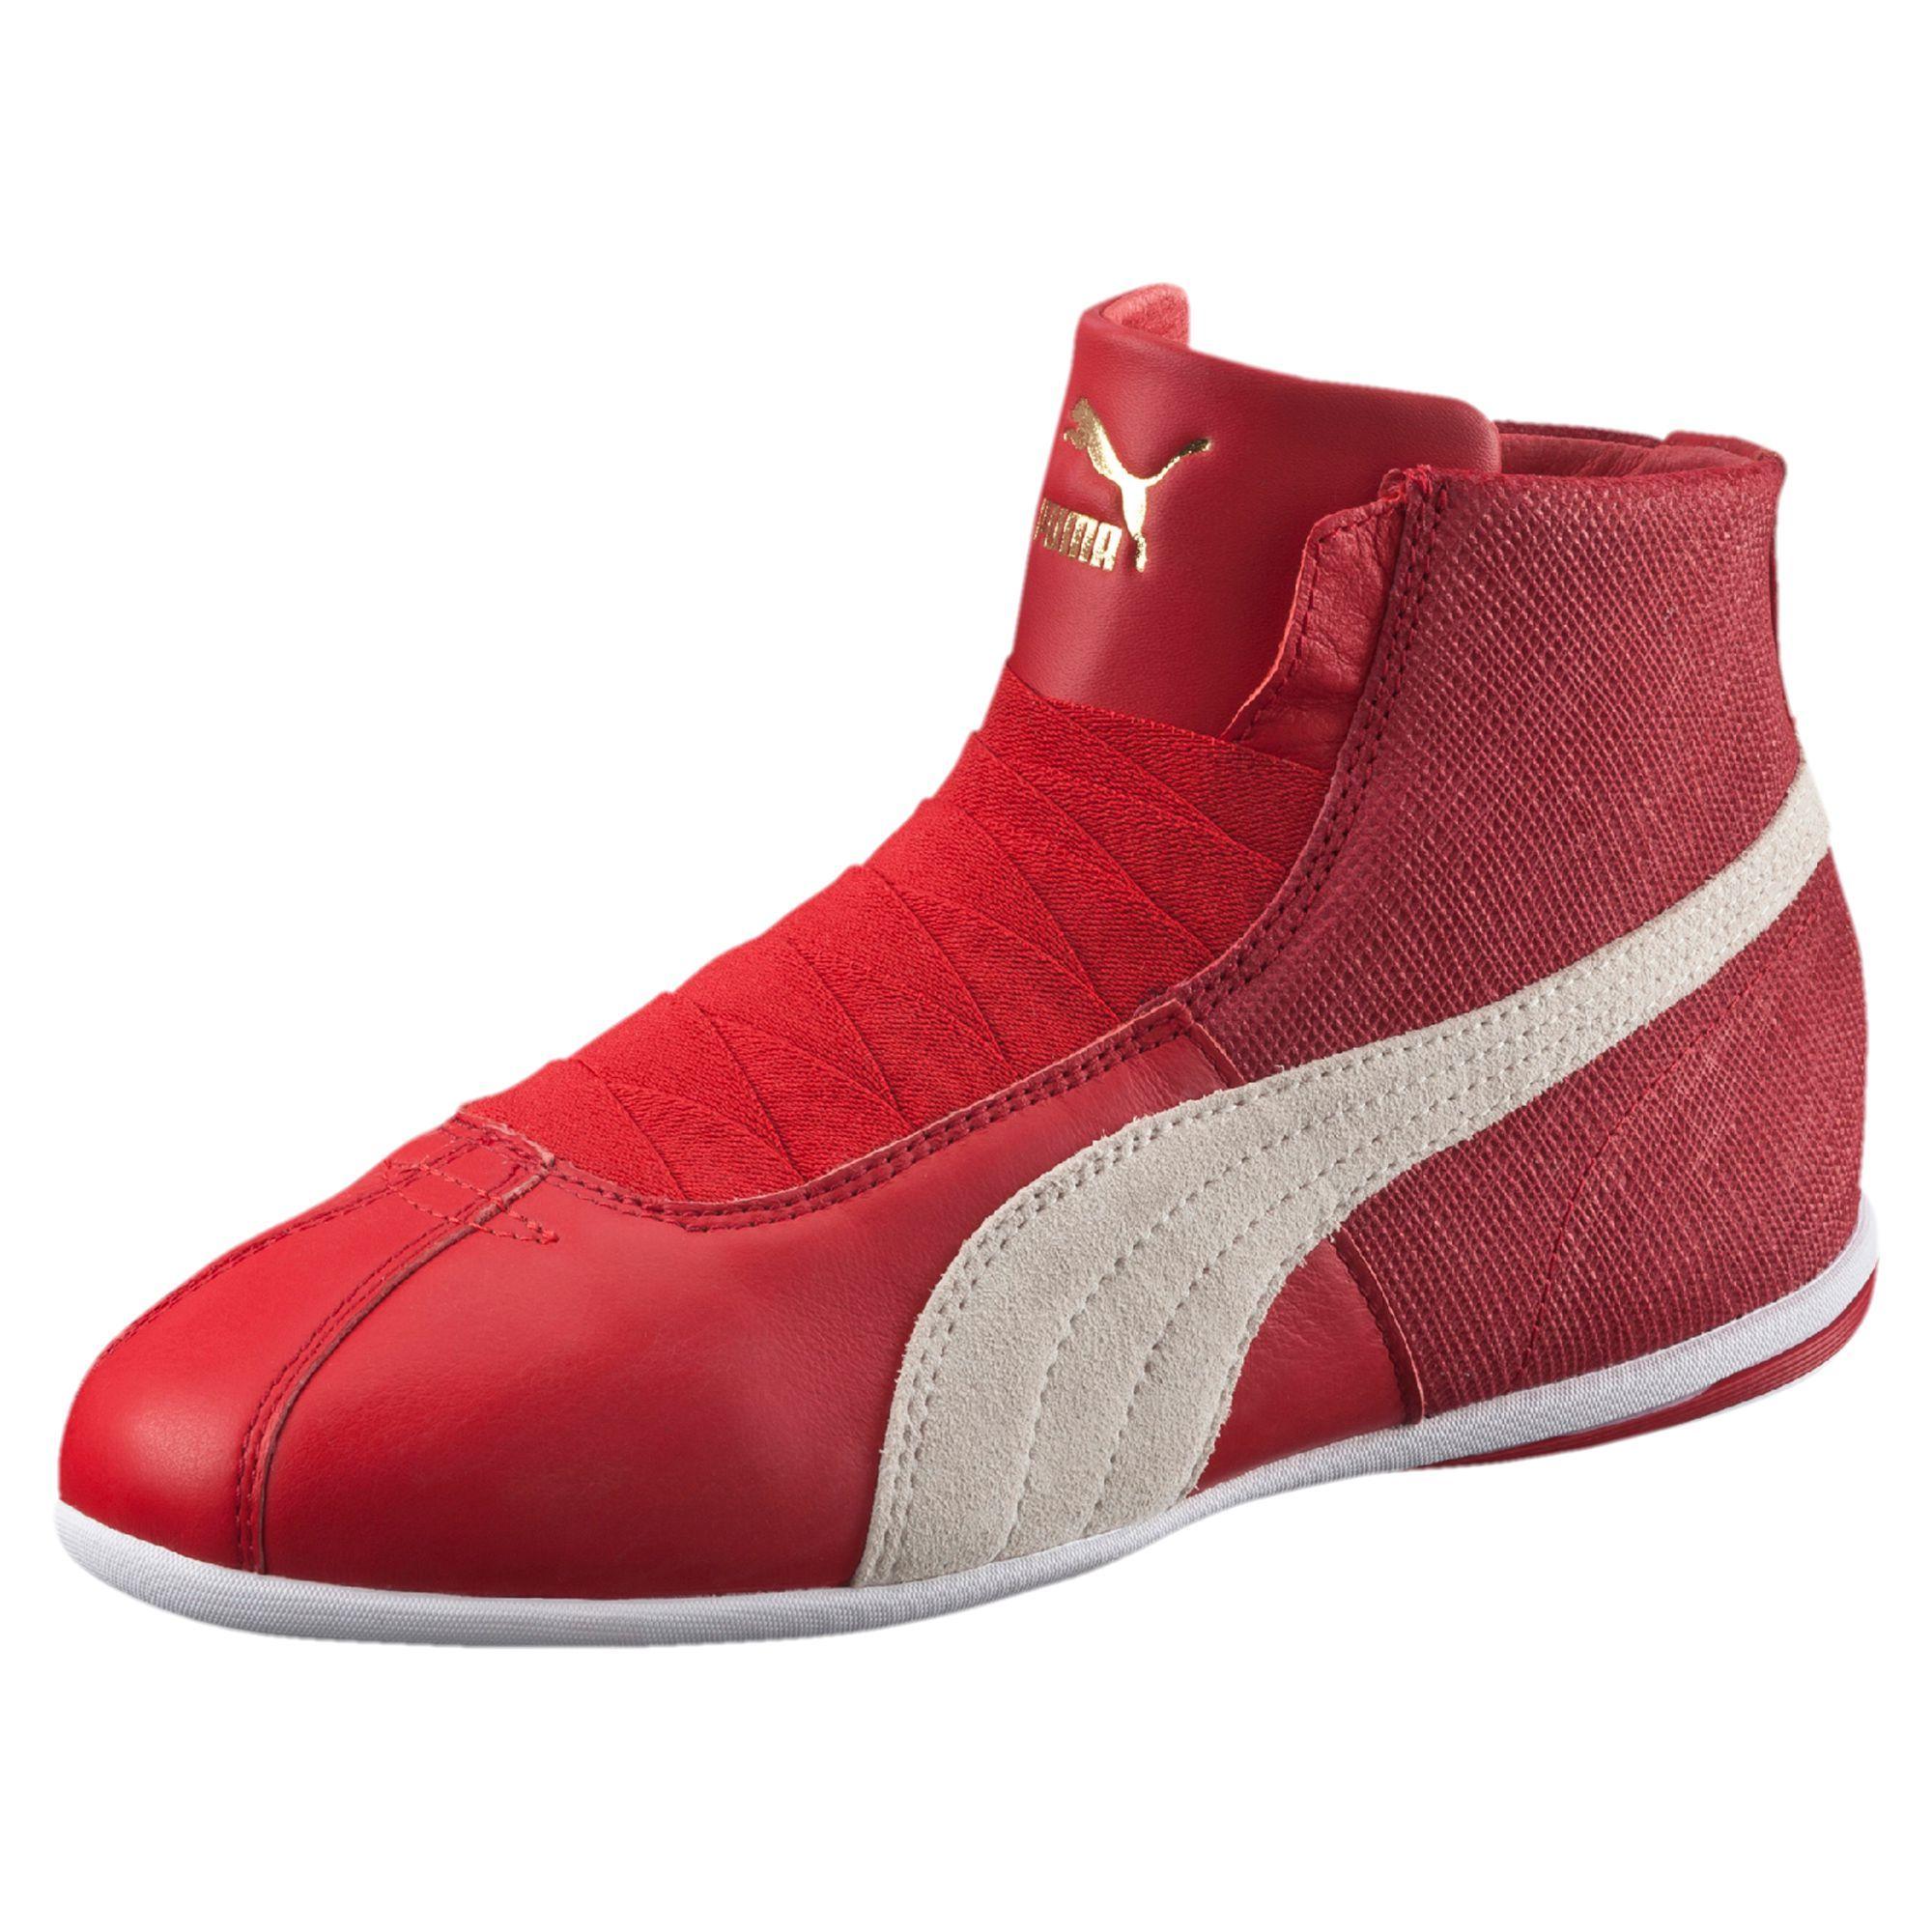 9c65f19f70e3 Chaussure montante Eskiva Mid Remaster pour femme